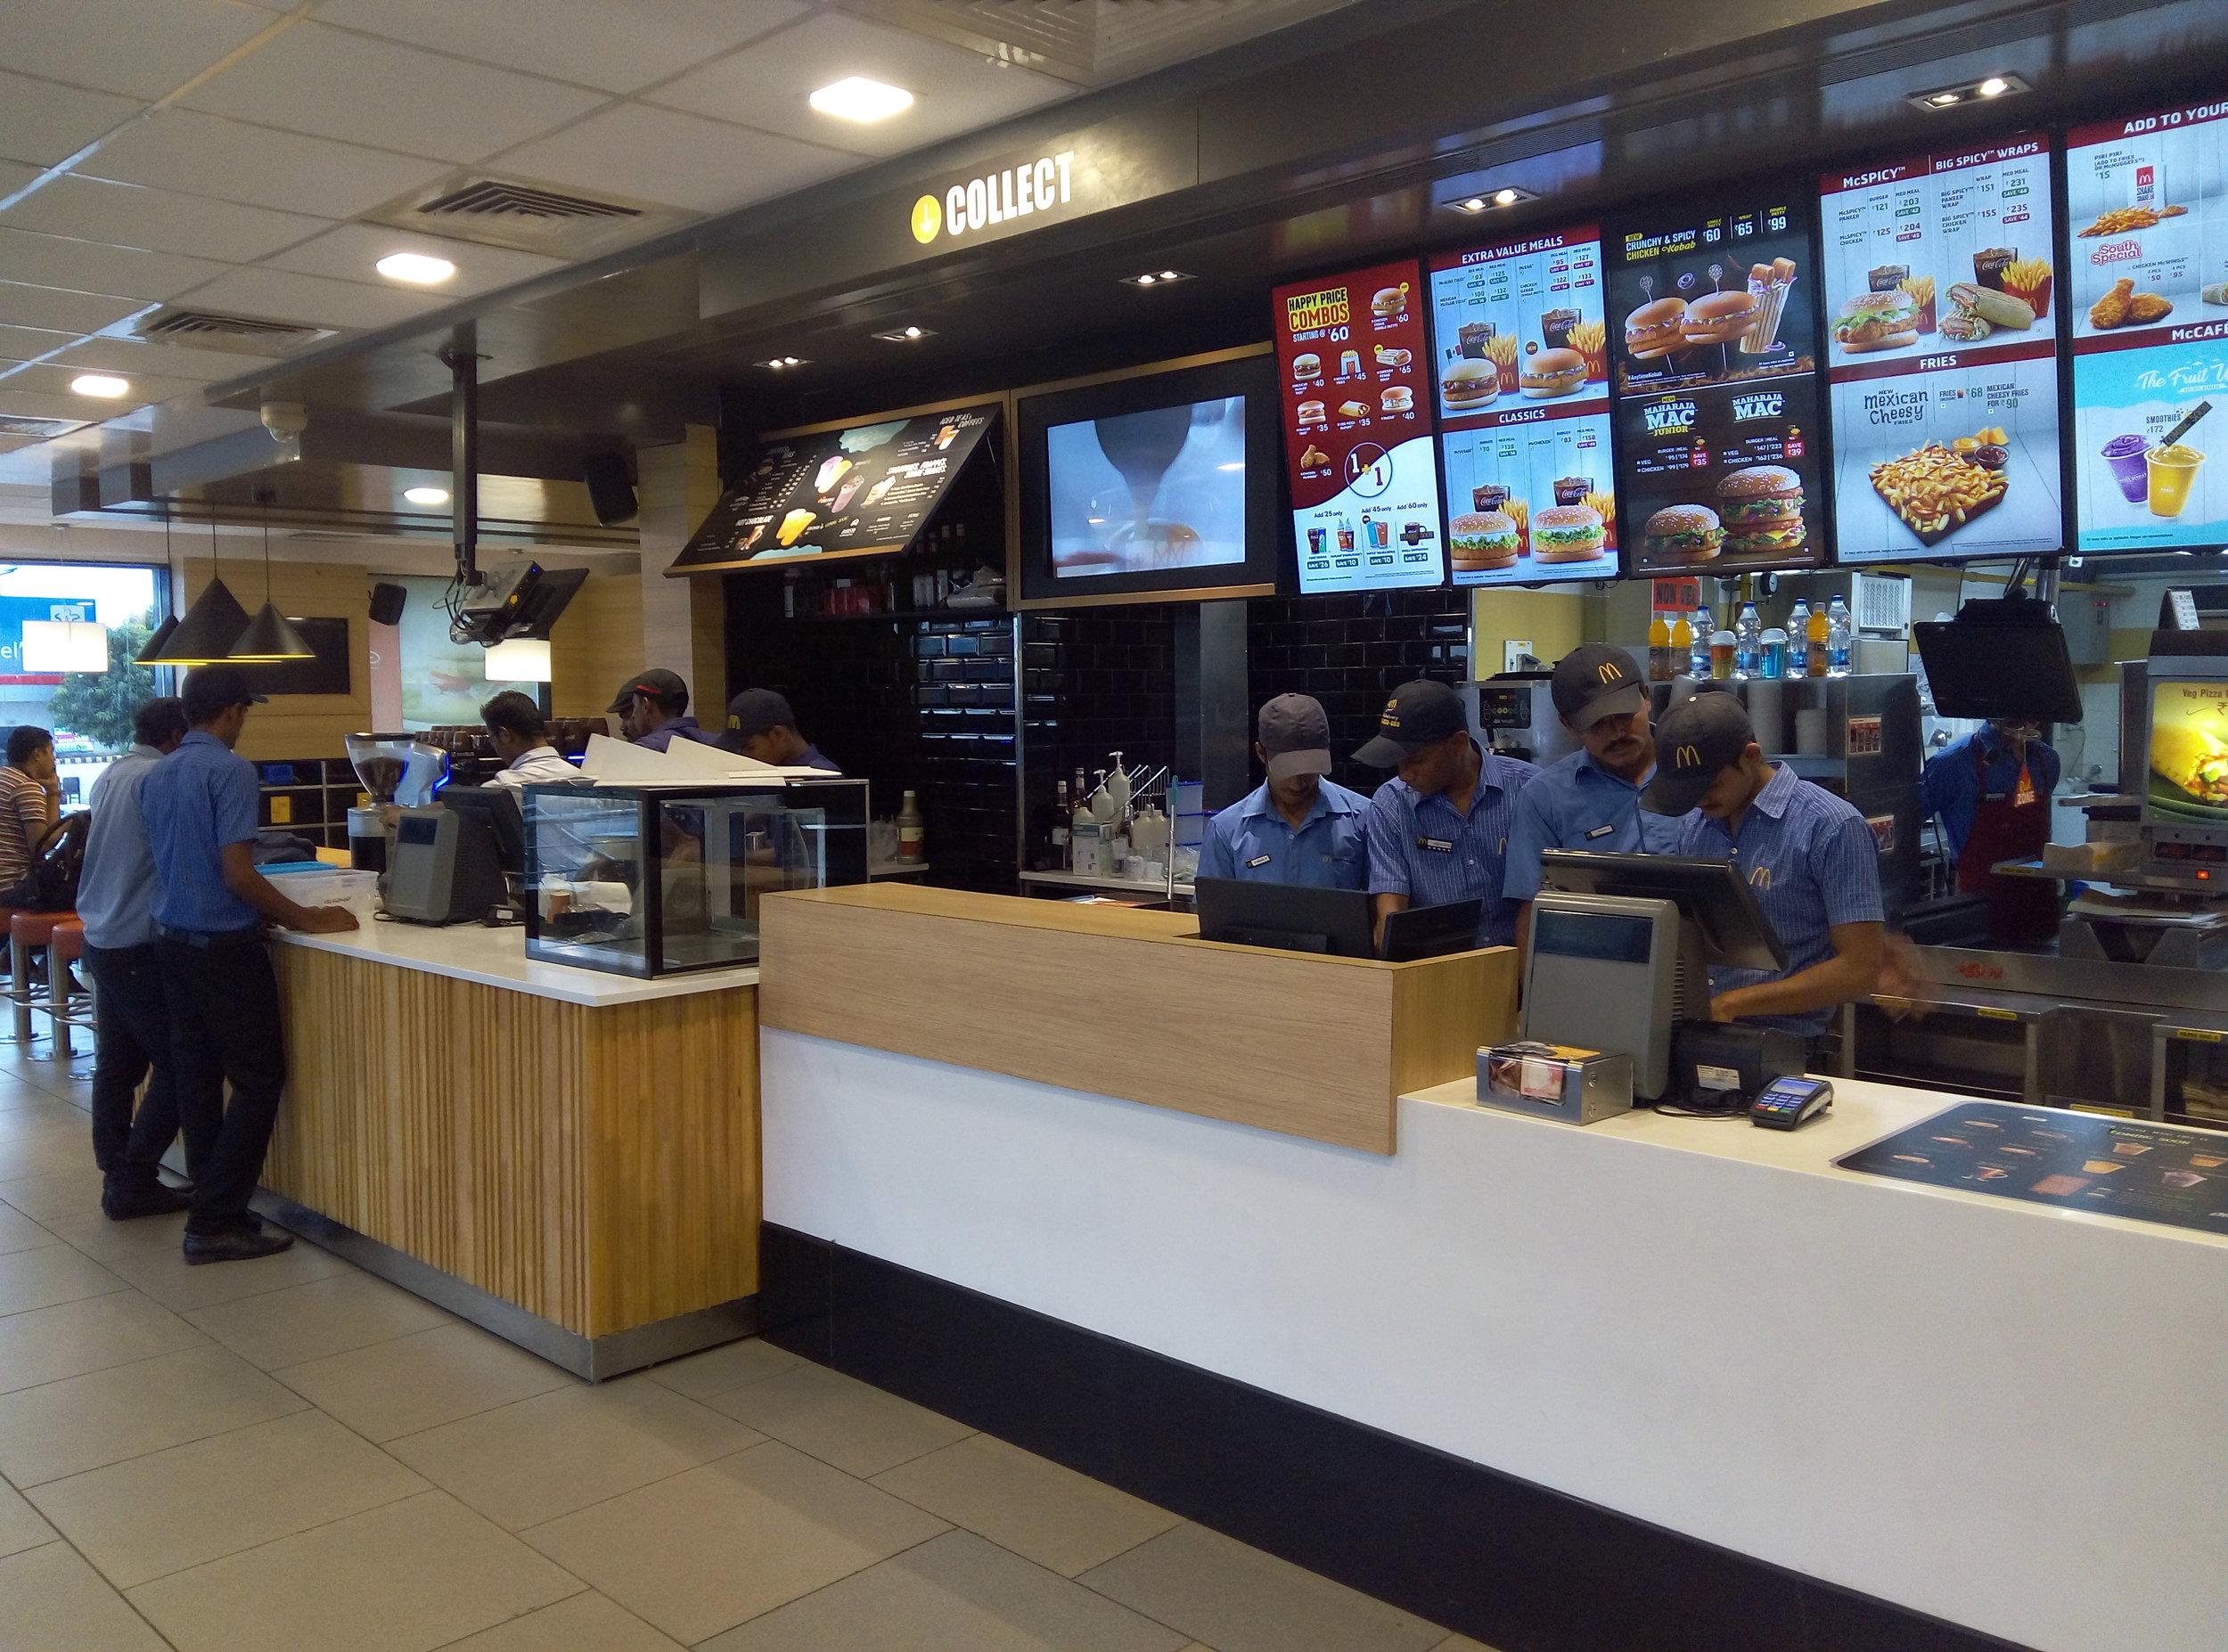 McDonalds India | Customer Service | Big Data | PritishSocial | Travel and Food